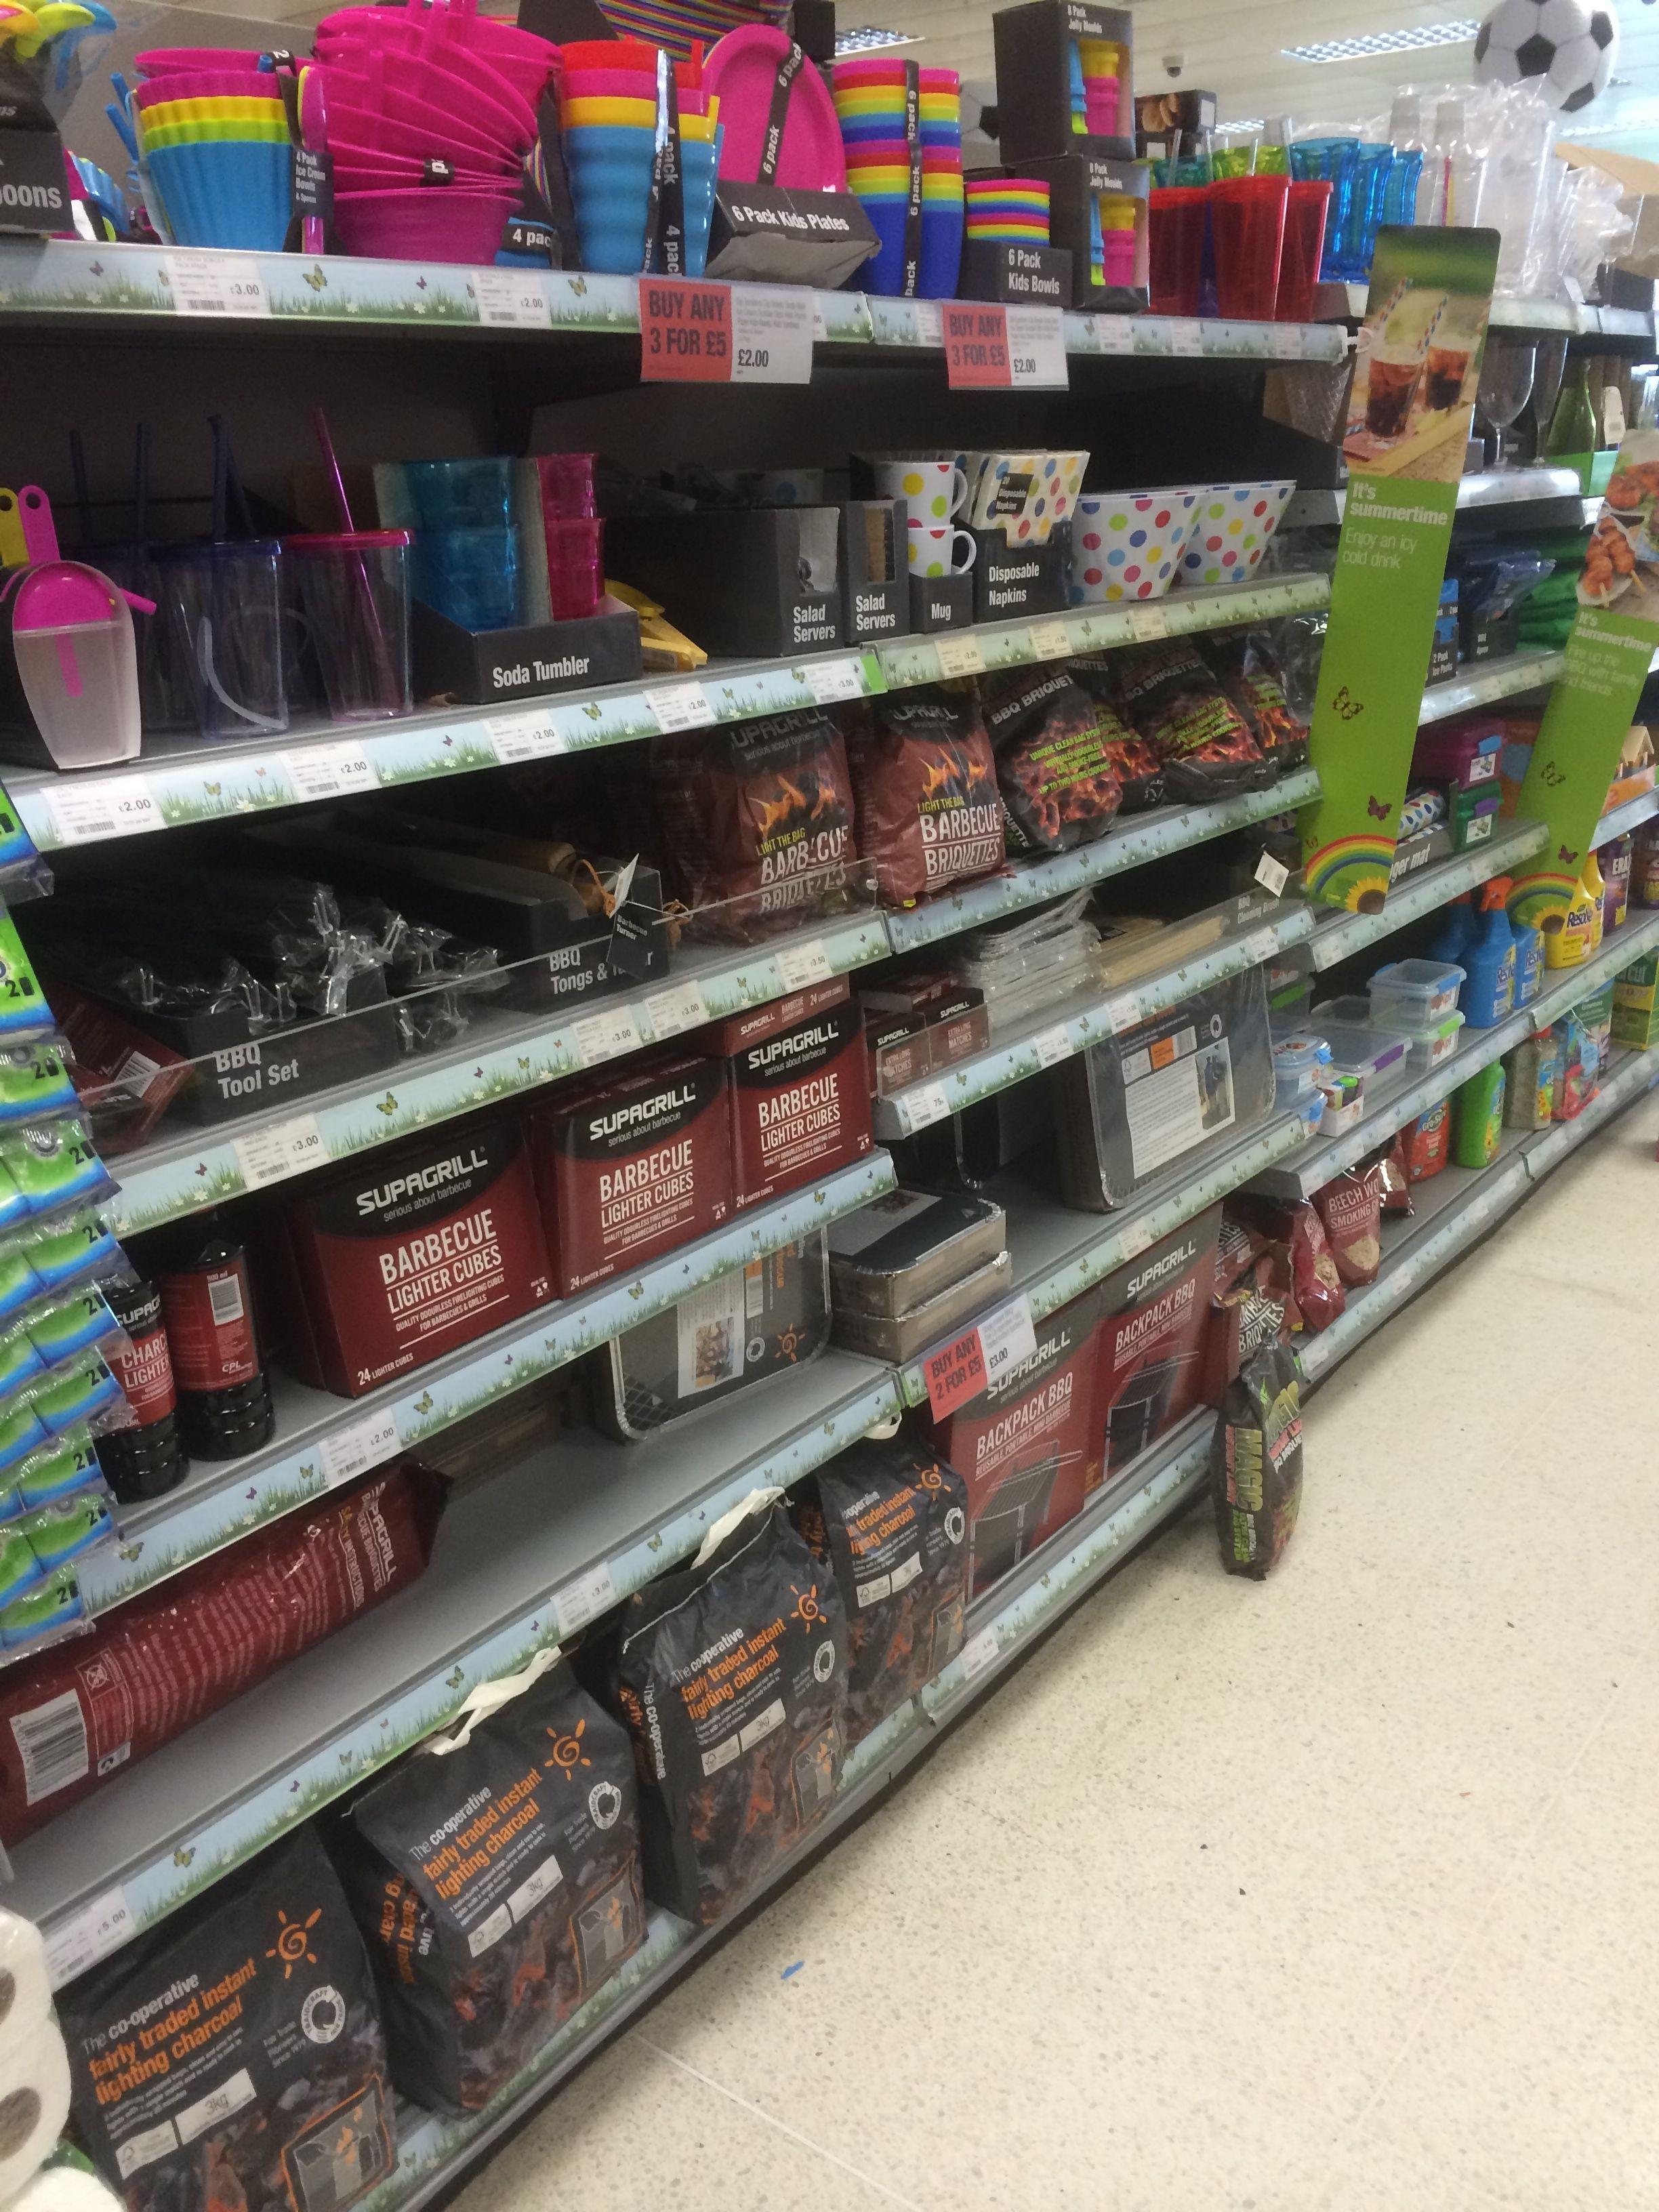 Co-Op - Non-Food - GM - General Merchandise - Layout - Customer Journey - Visual Merchandising - www.clearretailgroup.eu